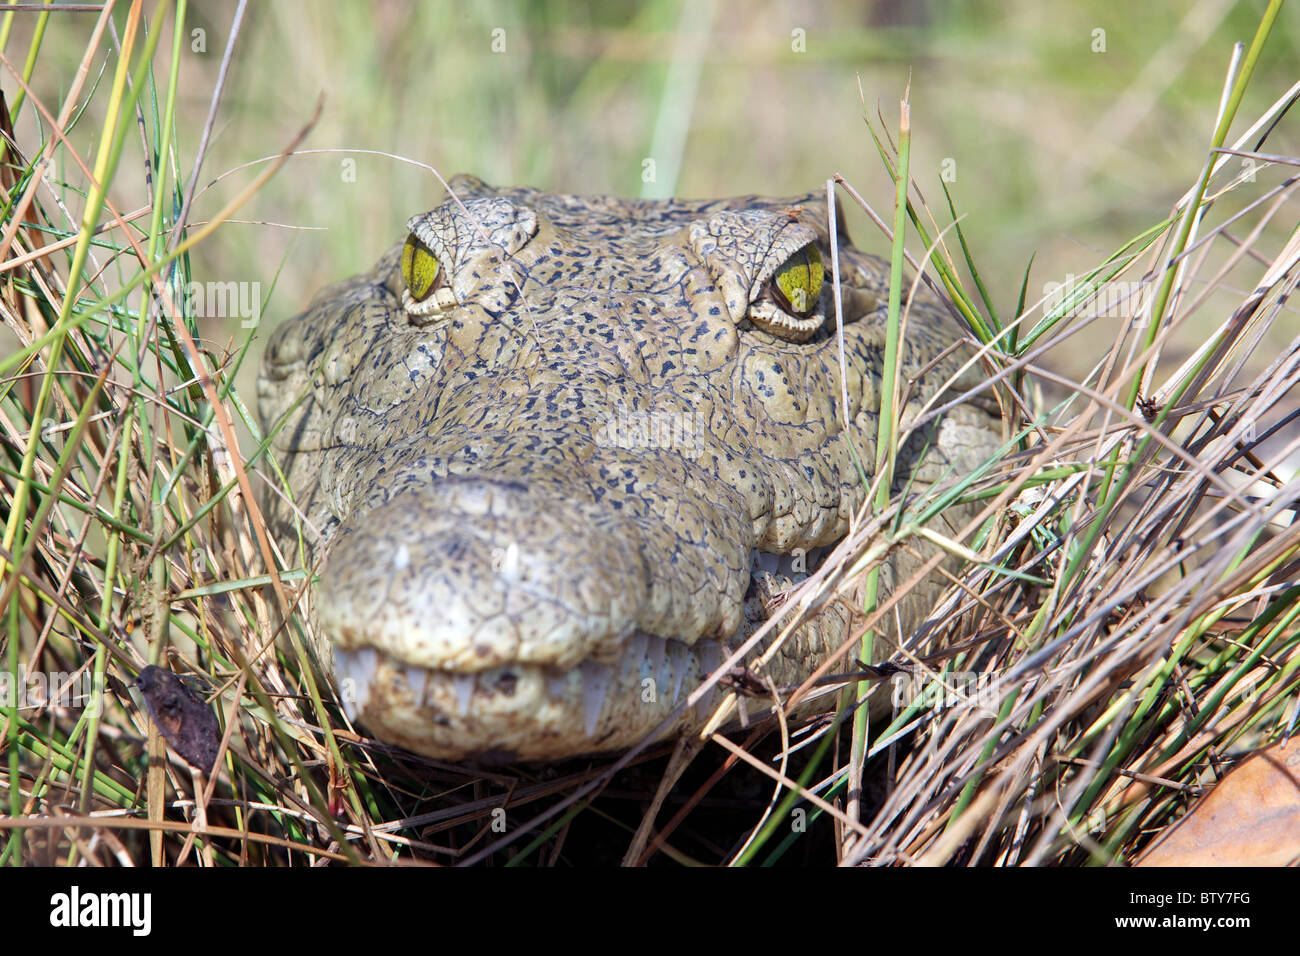 NILE CROCODILE ( Crocodylus niloticus ) Saadani National Park Tanzania - Stock Image